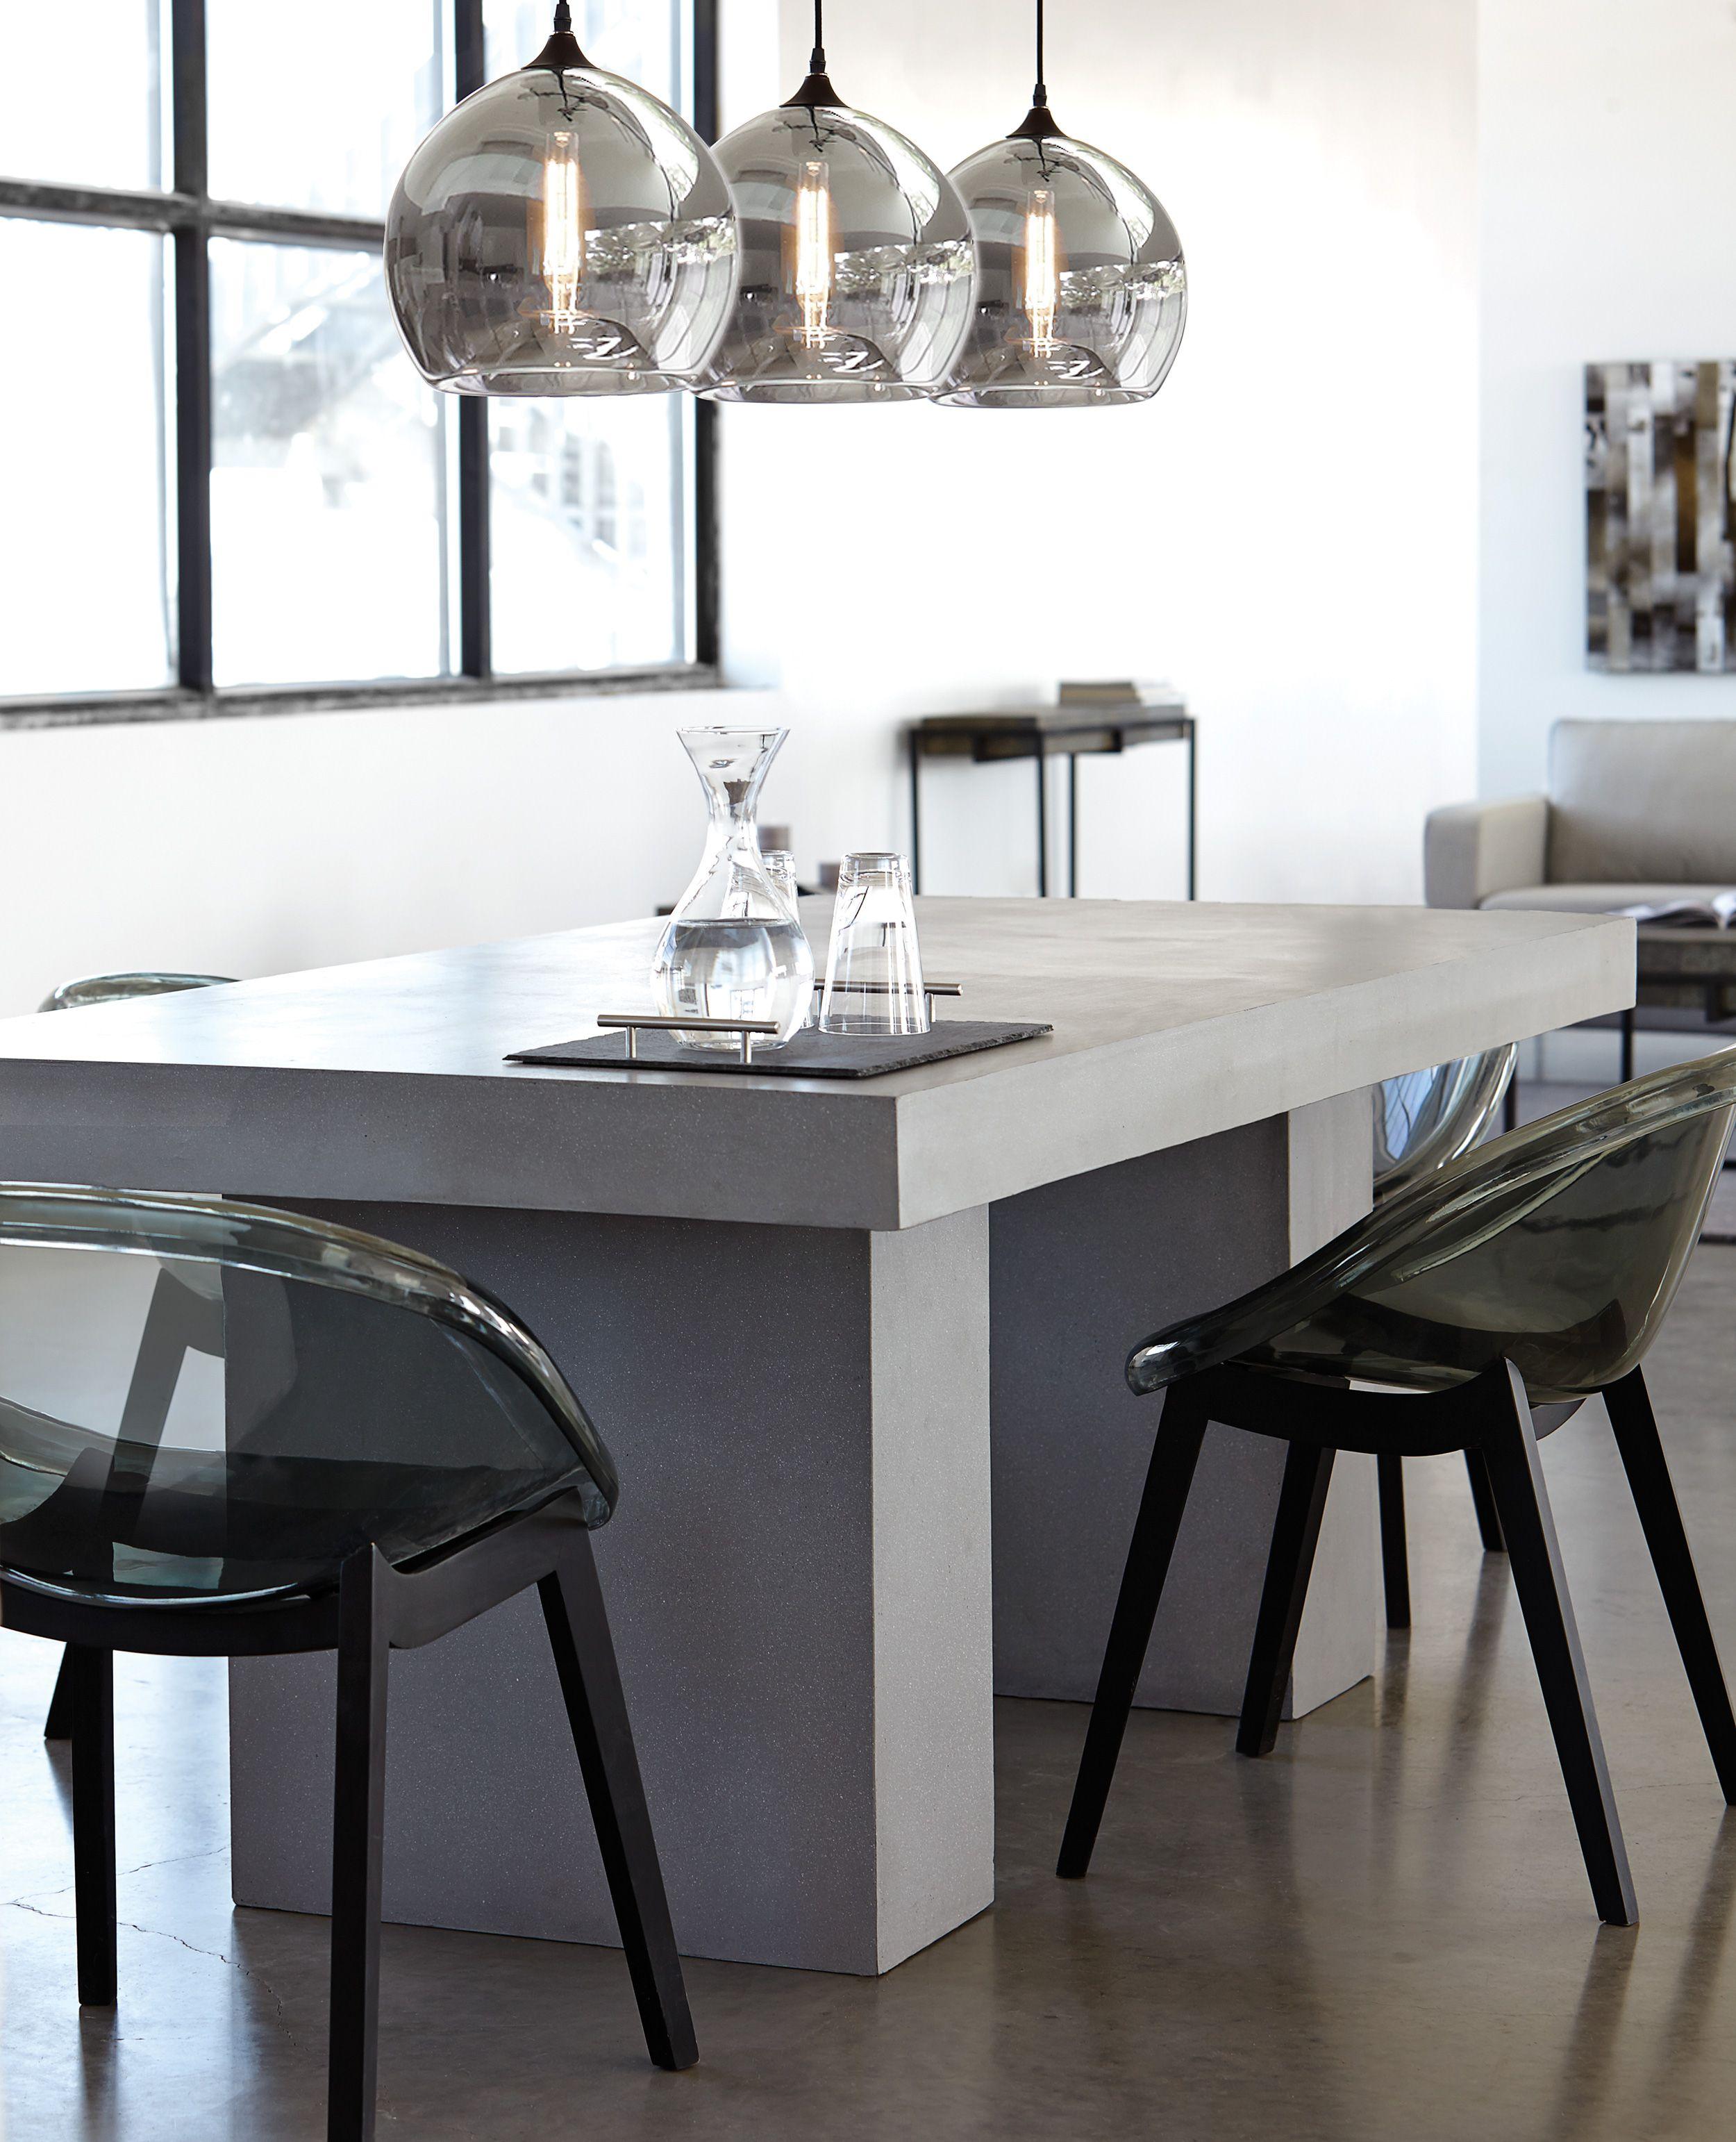 Monochromatic Dining Room Decor | Acrylic dining chairs ...